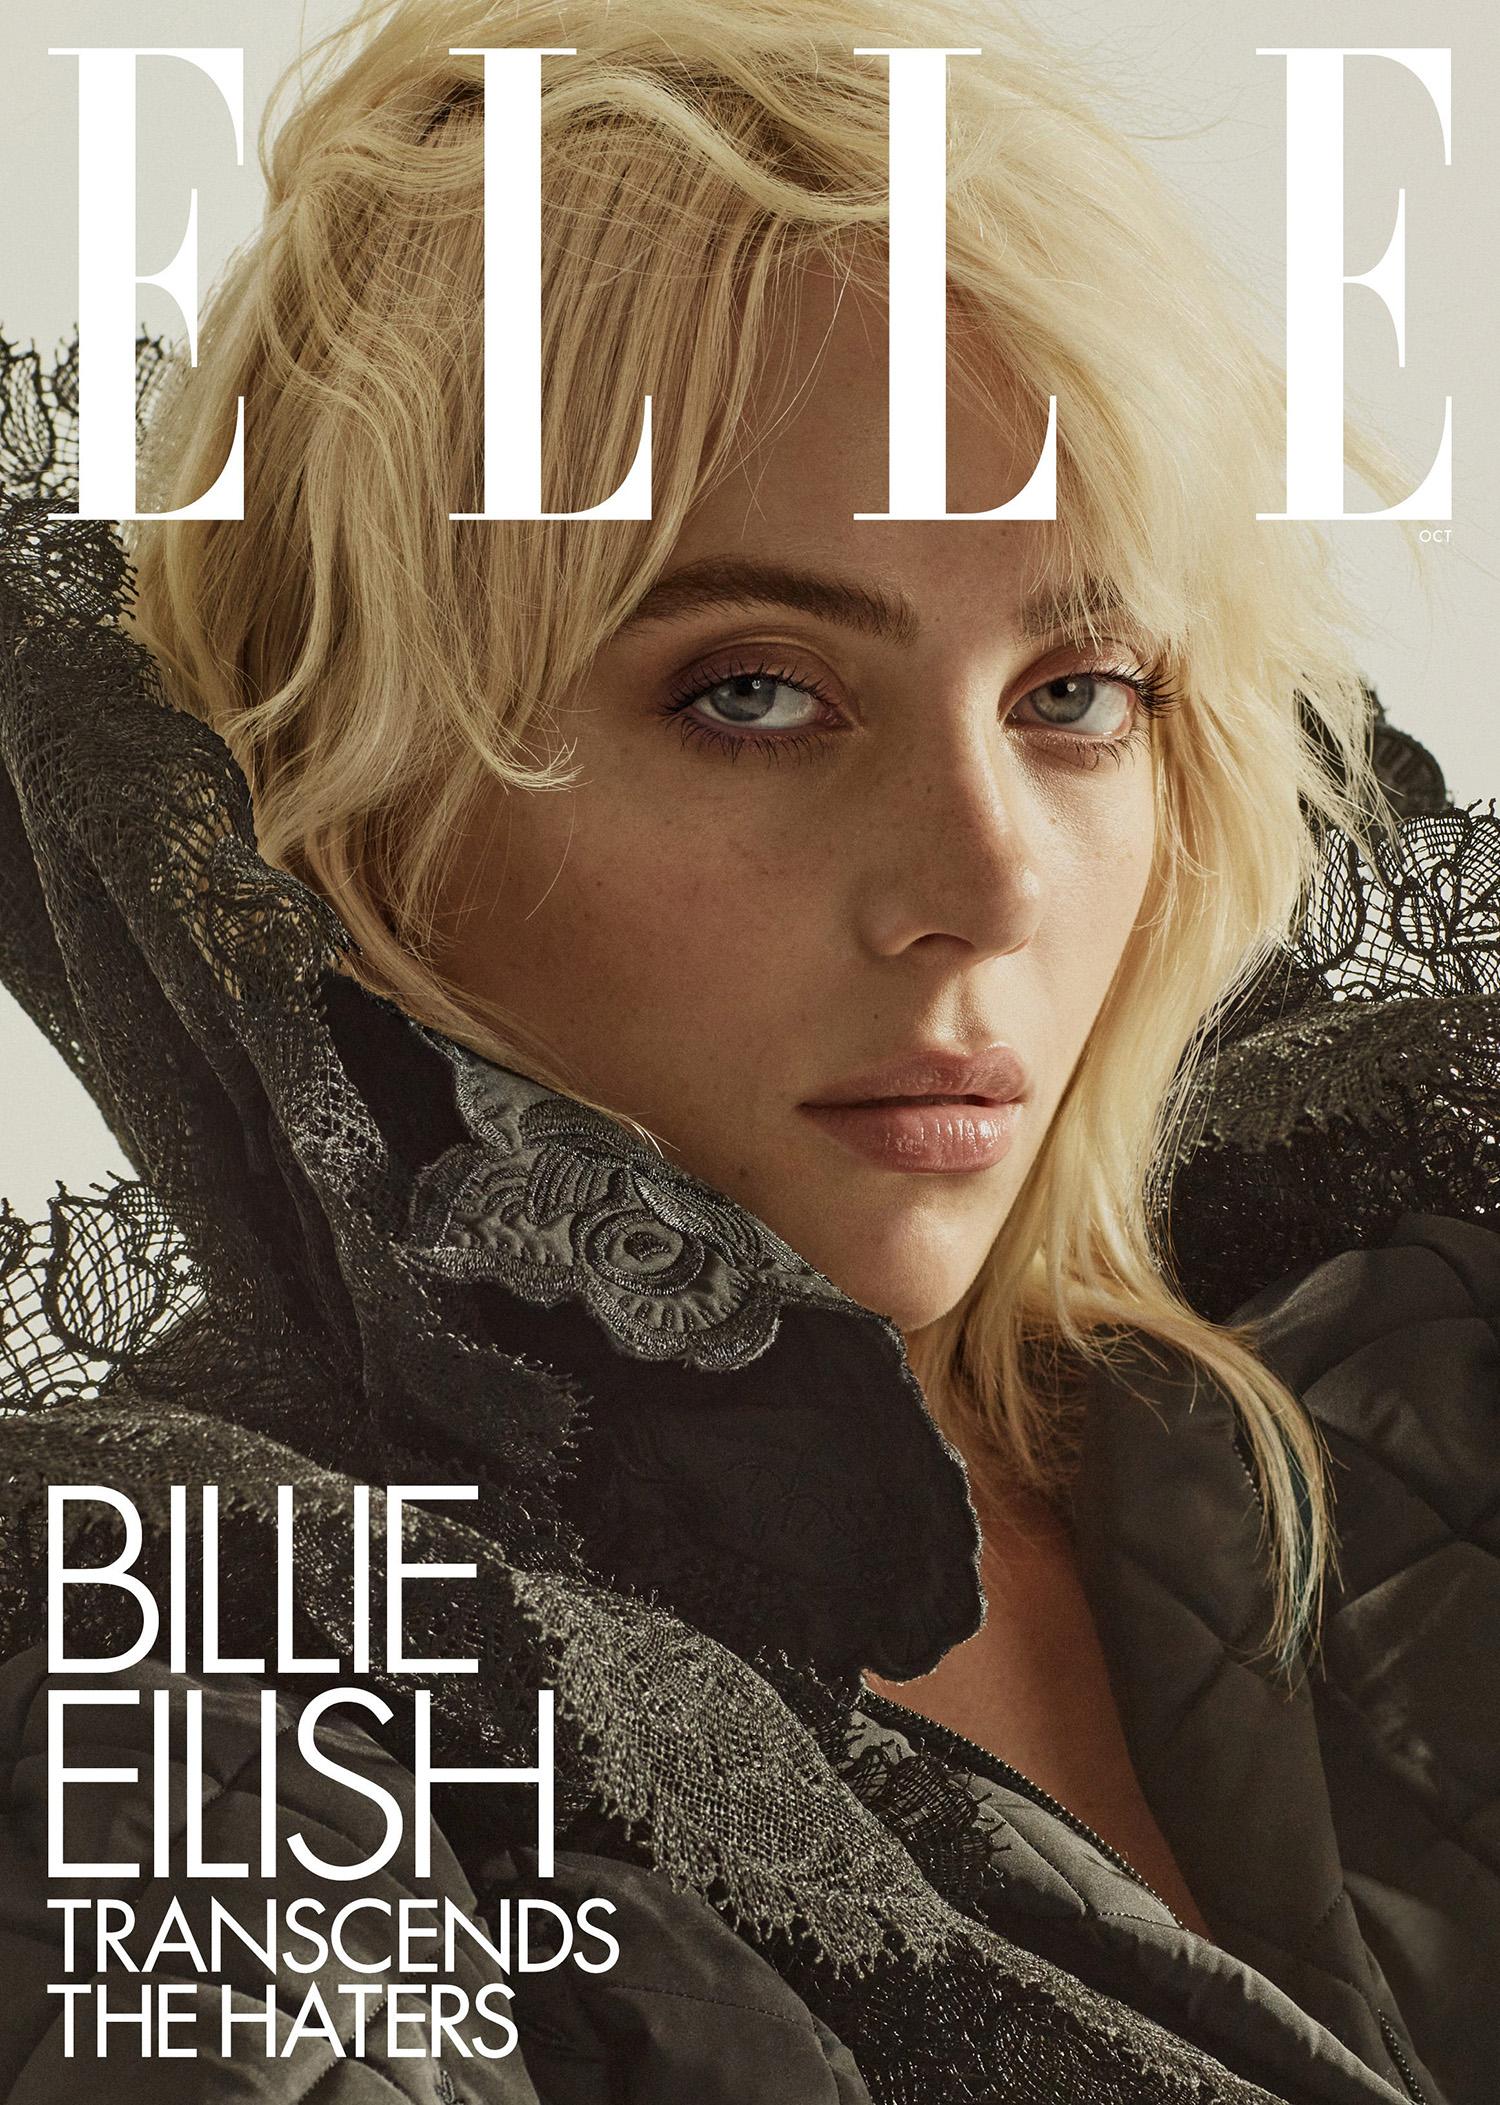 Billie Eilish covers Elle US October 2021 by Alique